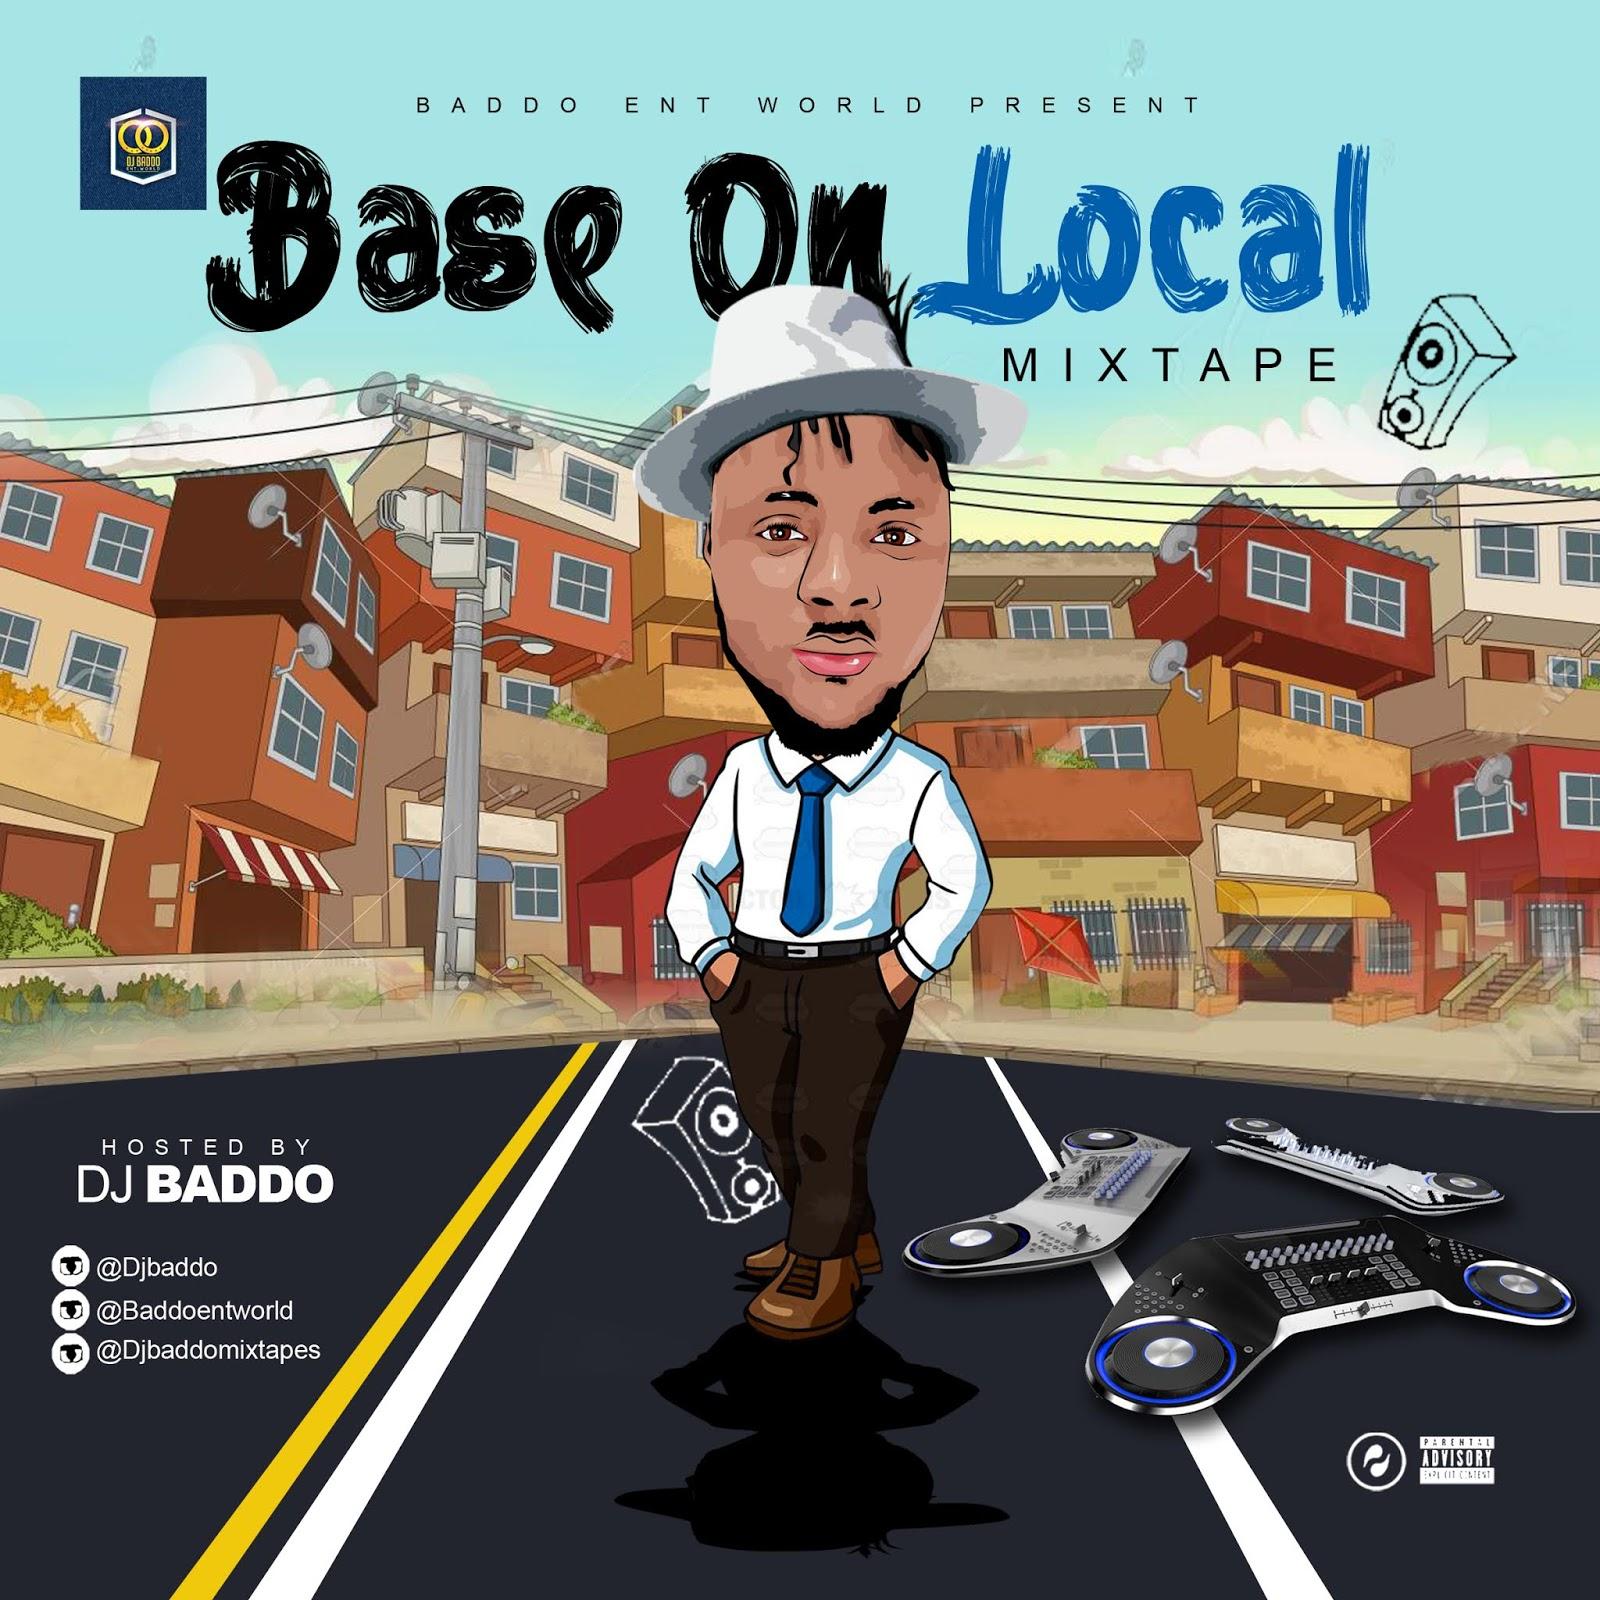 MIXTAPE: Dj Baddo Base On Local Mix